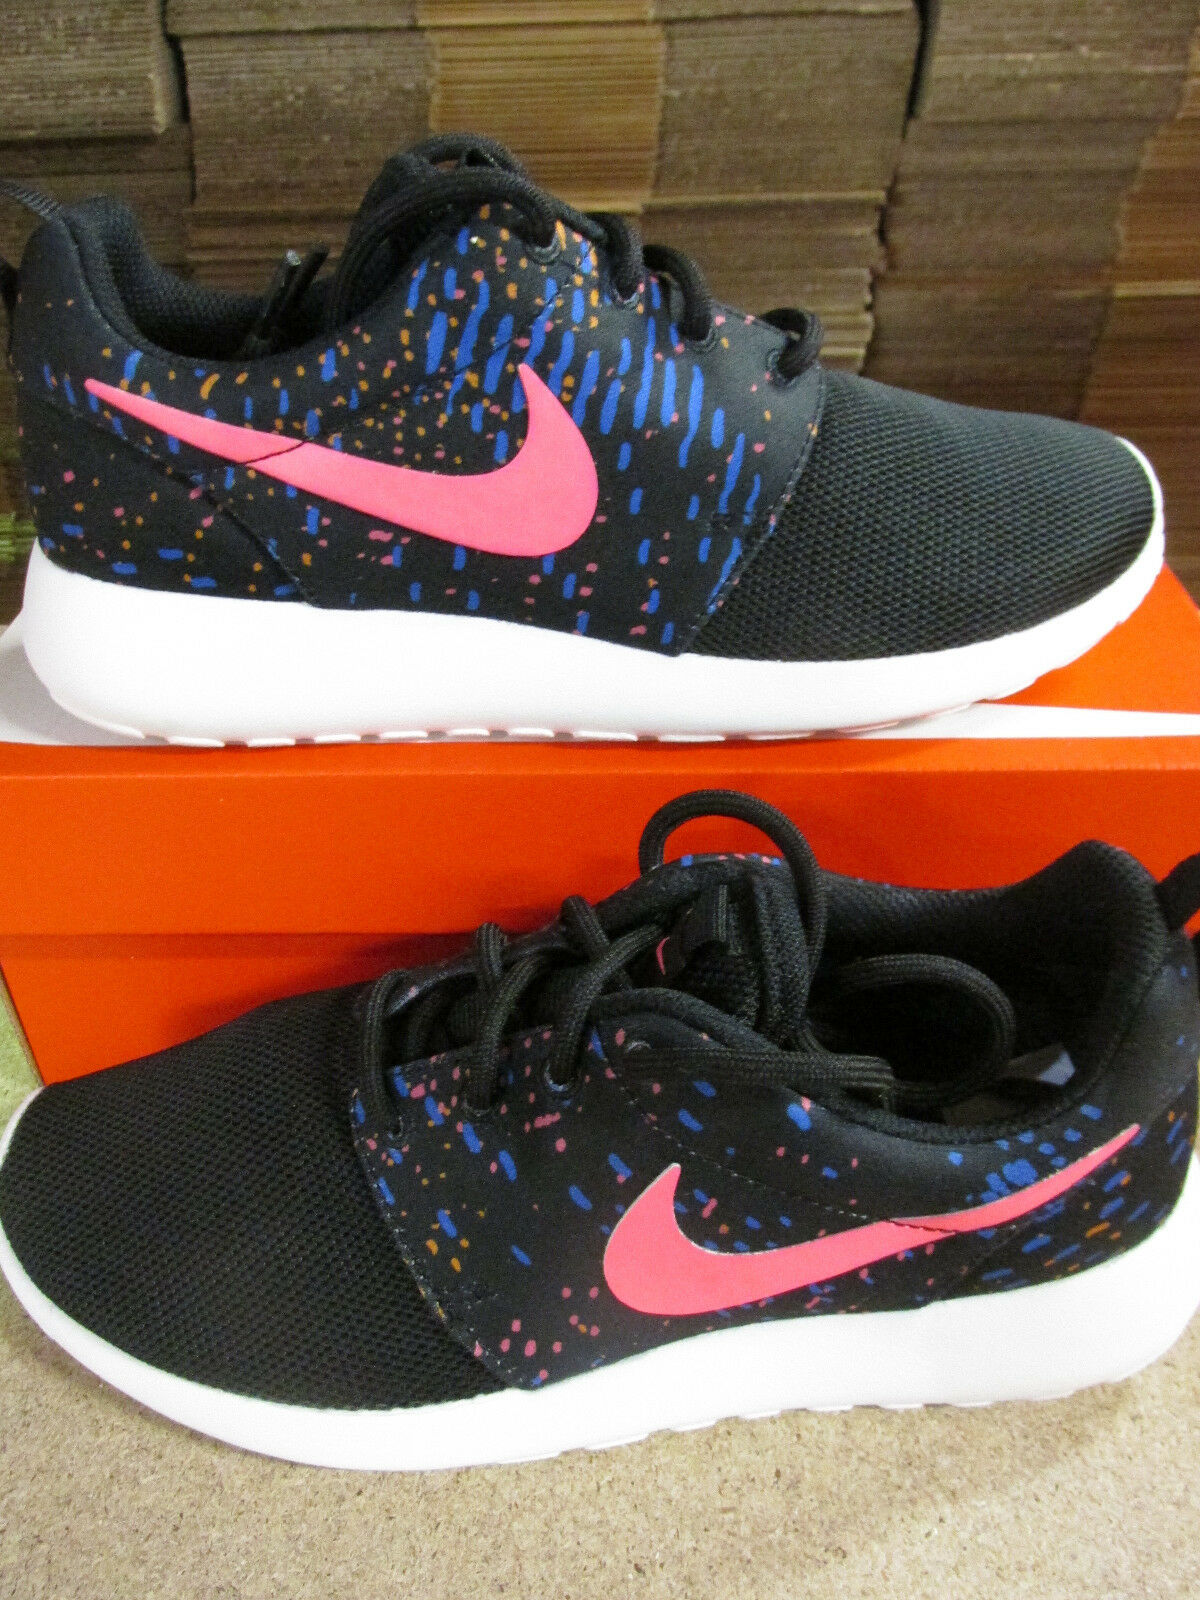 Nike donna Roshe One Print Running  Trainers 84958 003 Scarpe scarpe da ginnastica  economico